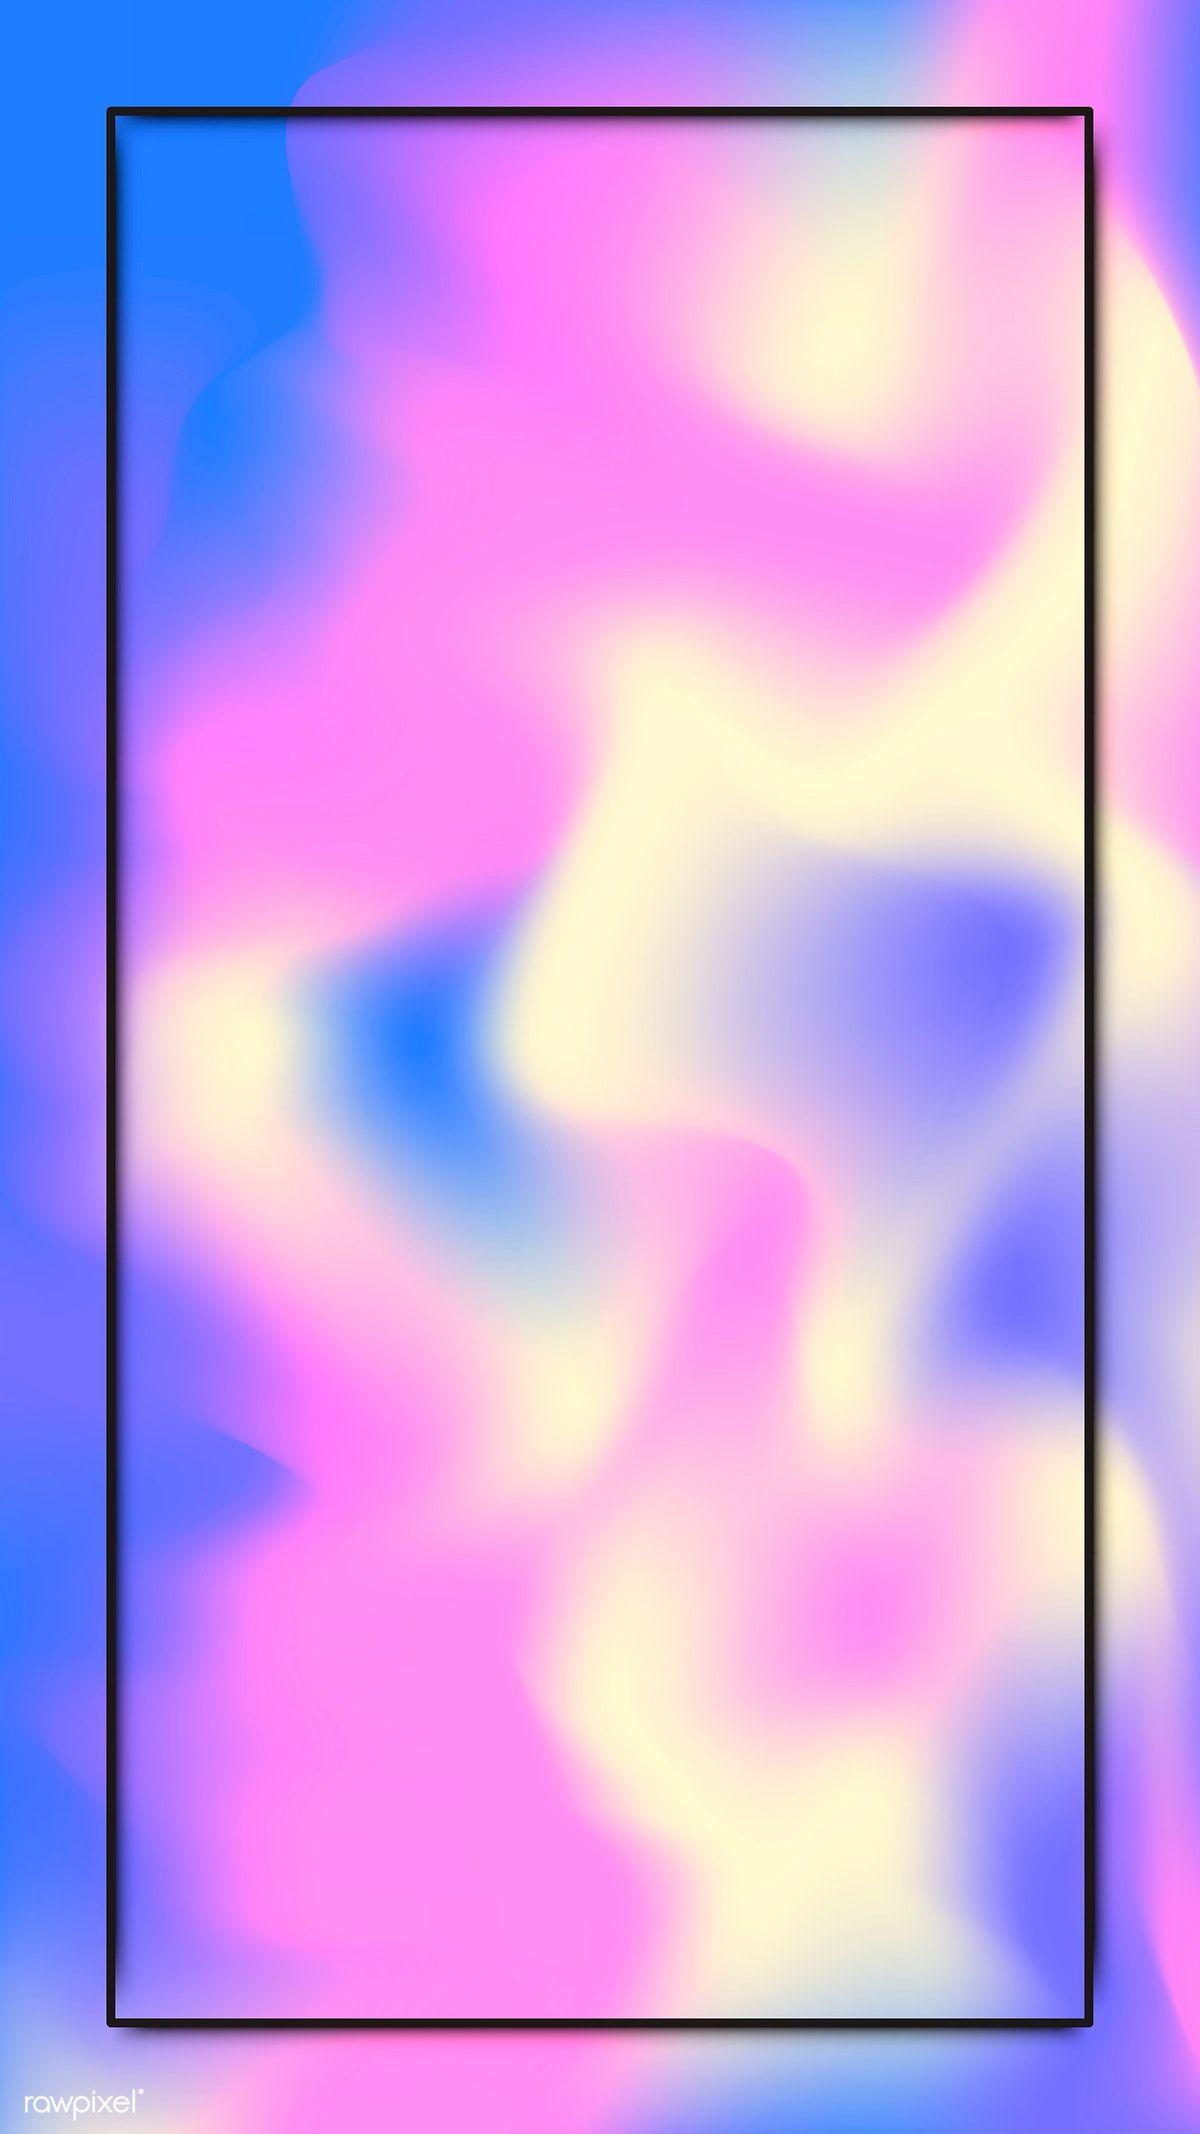 Download premium vector of Black frame on pastel